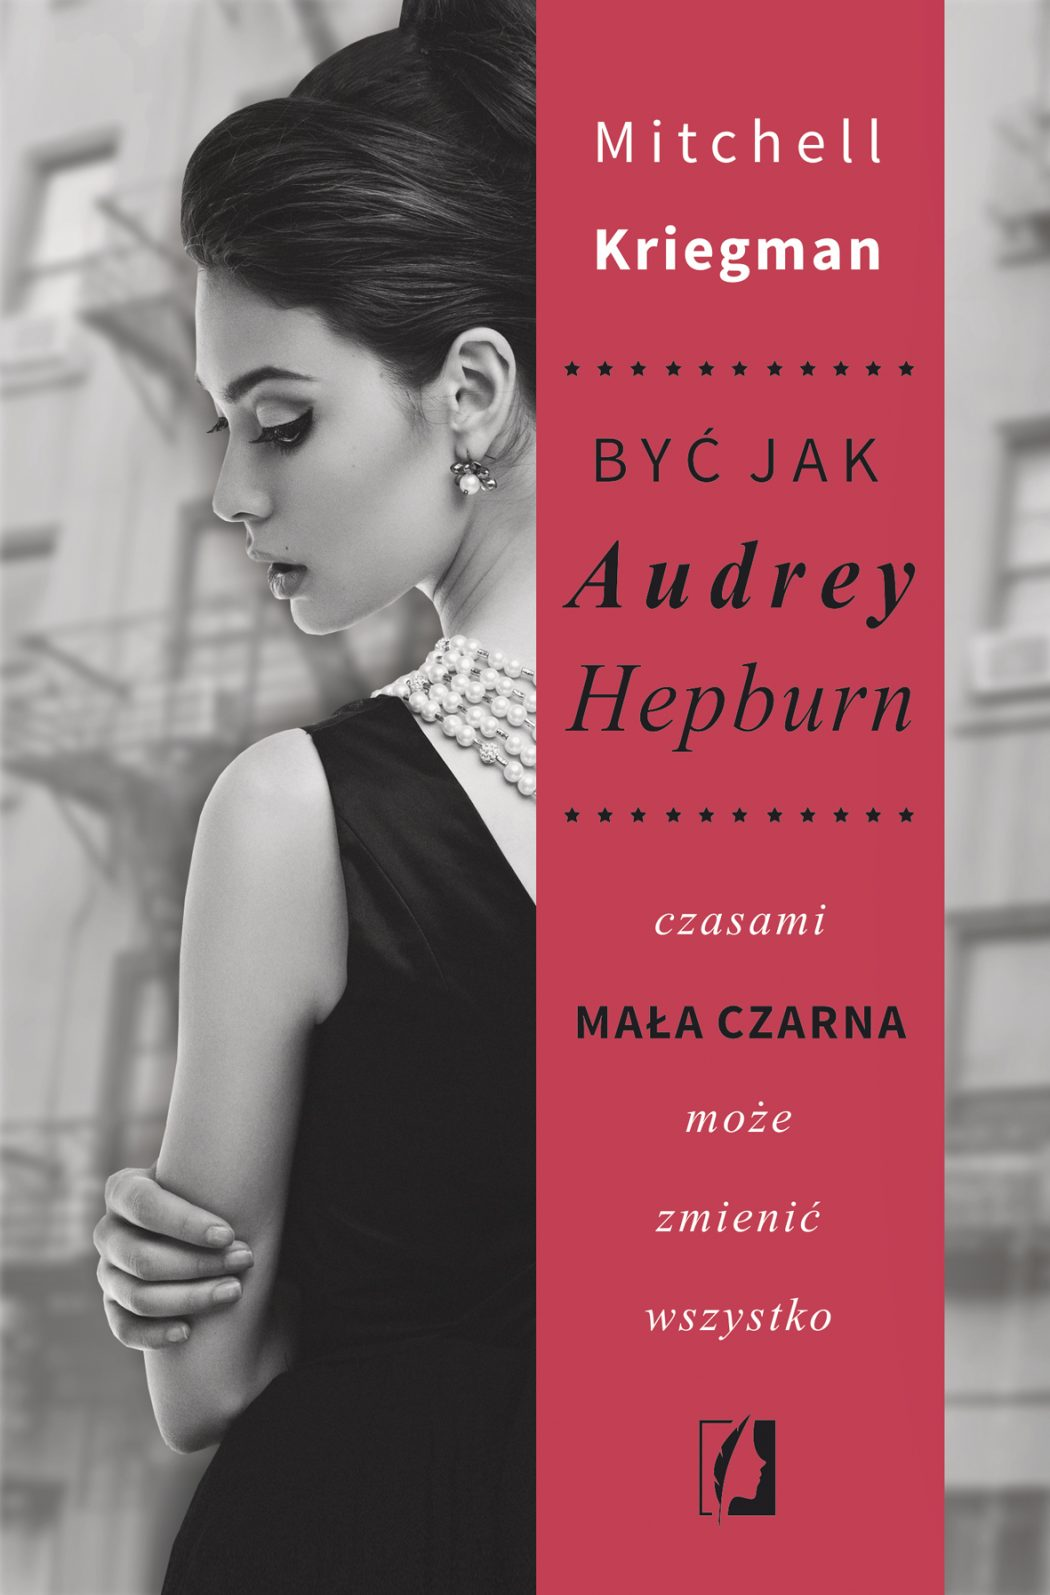 magazynkobiet.pl - Być jak Audrey 300 1050x1595 - Być jak Audrey Hepburn